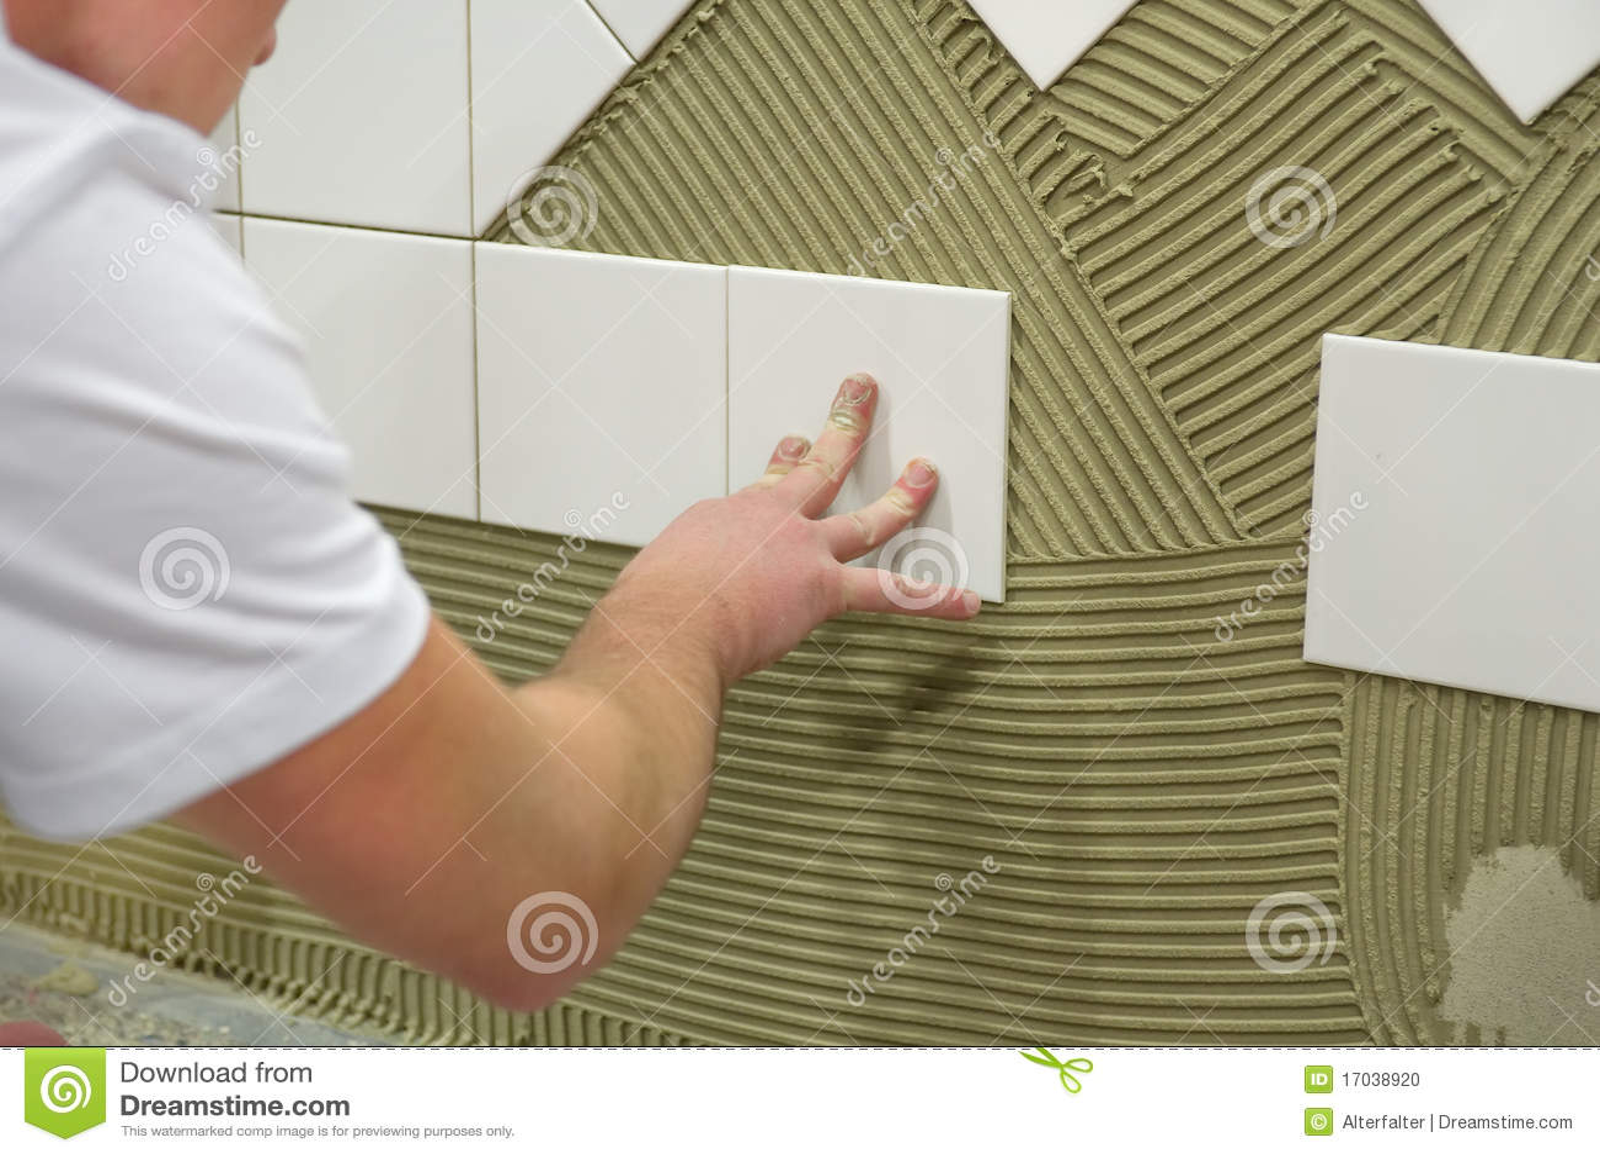 Wall Tile Glue Stock Photo Image 17038920